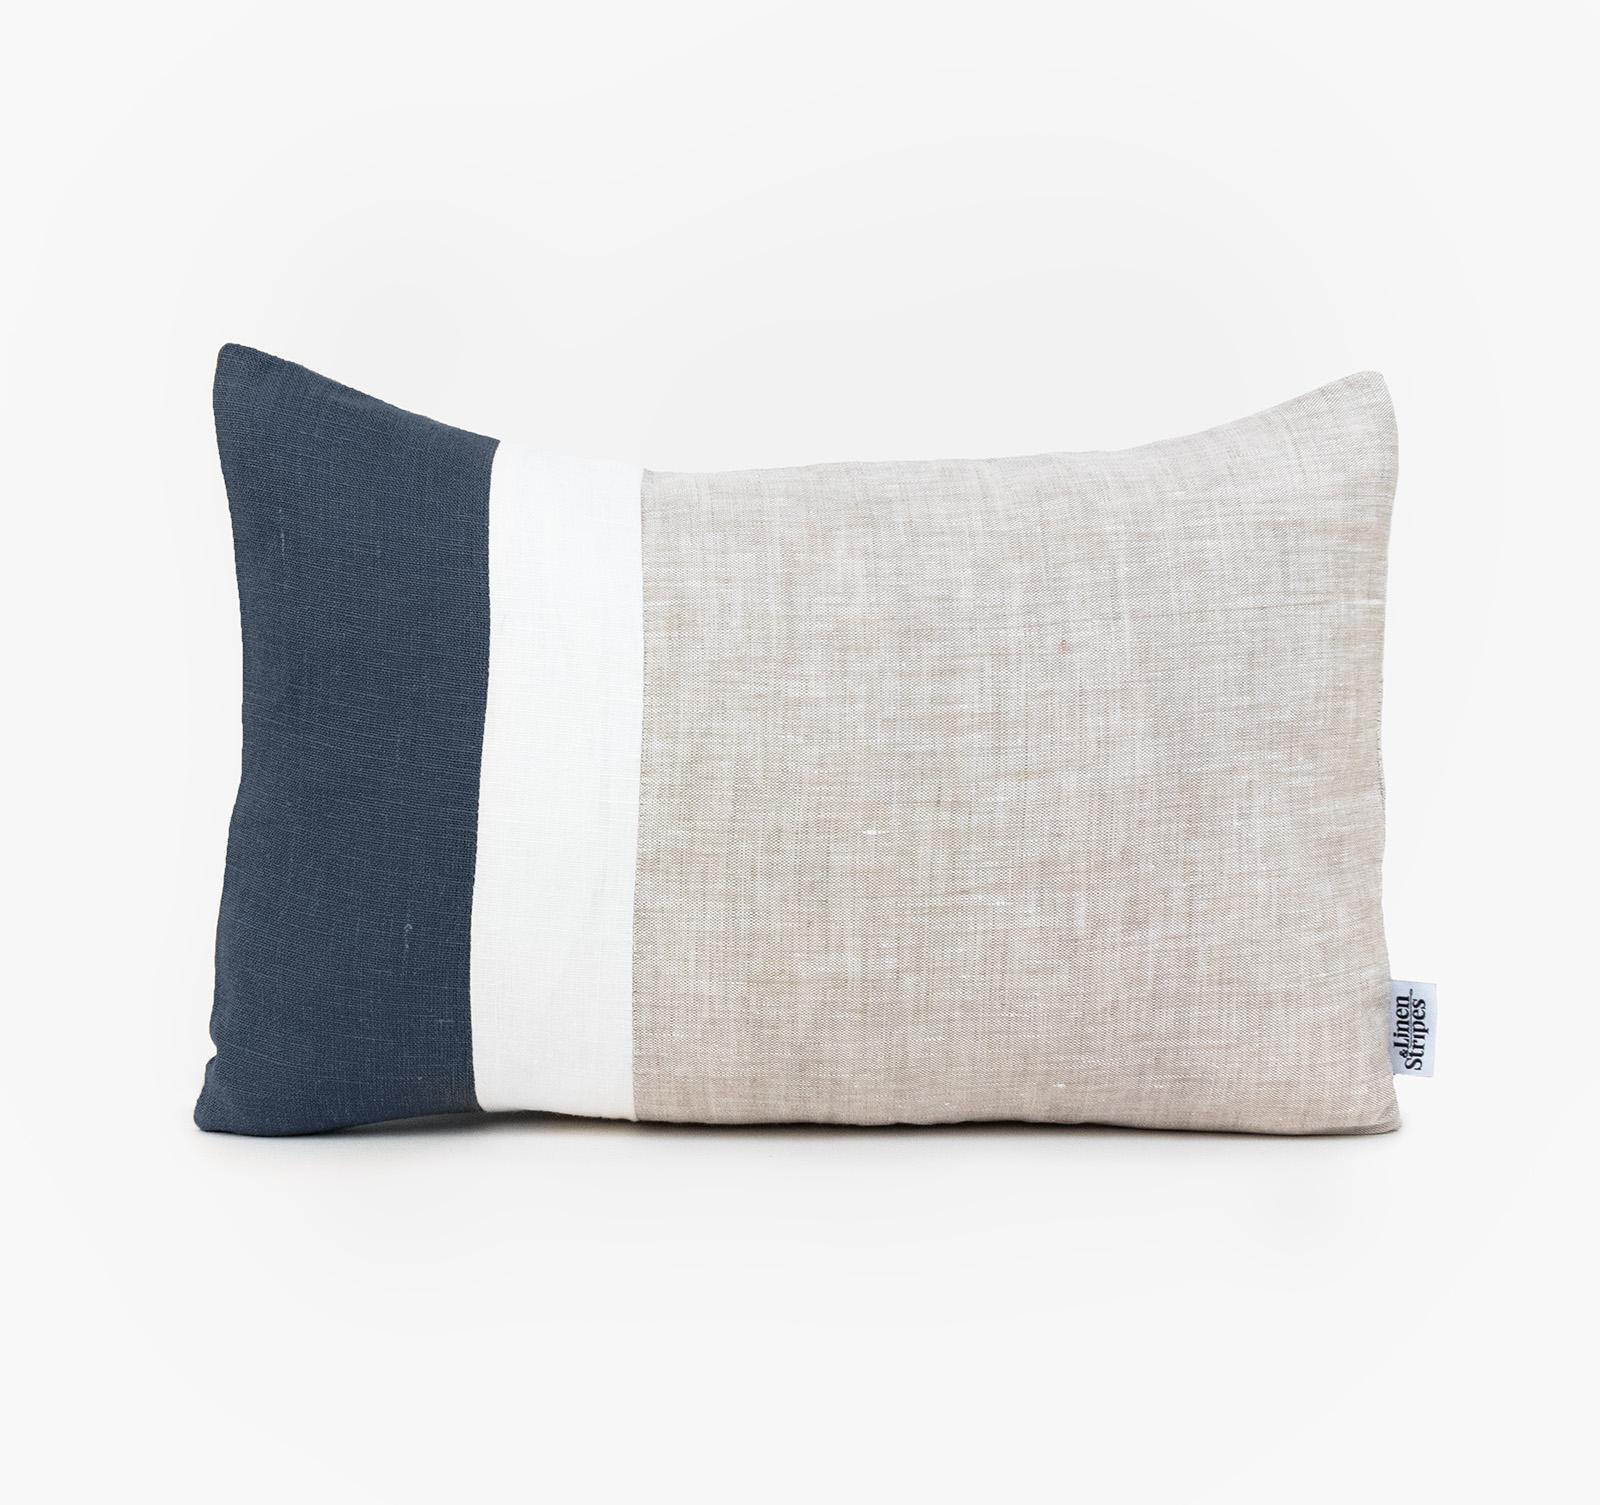 Color Block Lumbar Pillow Cover Black